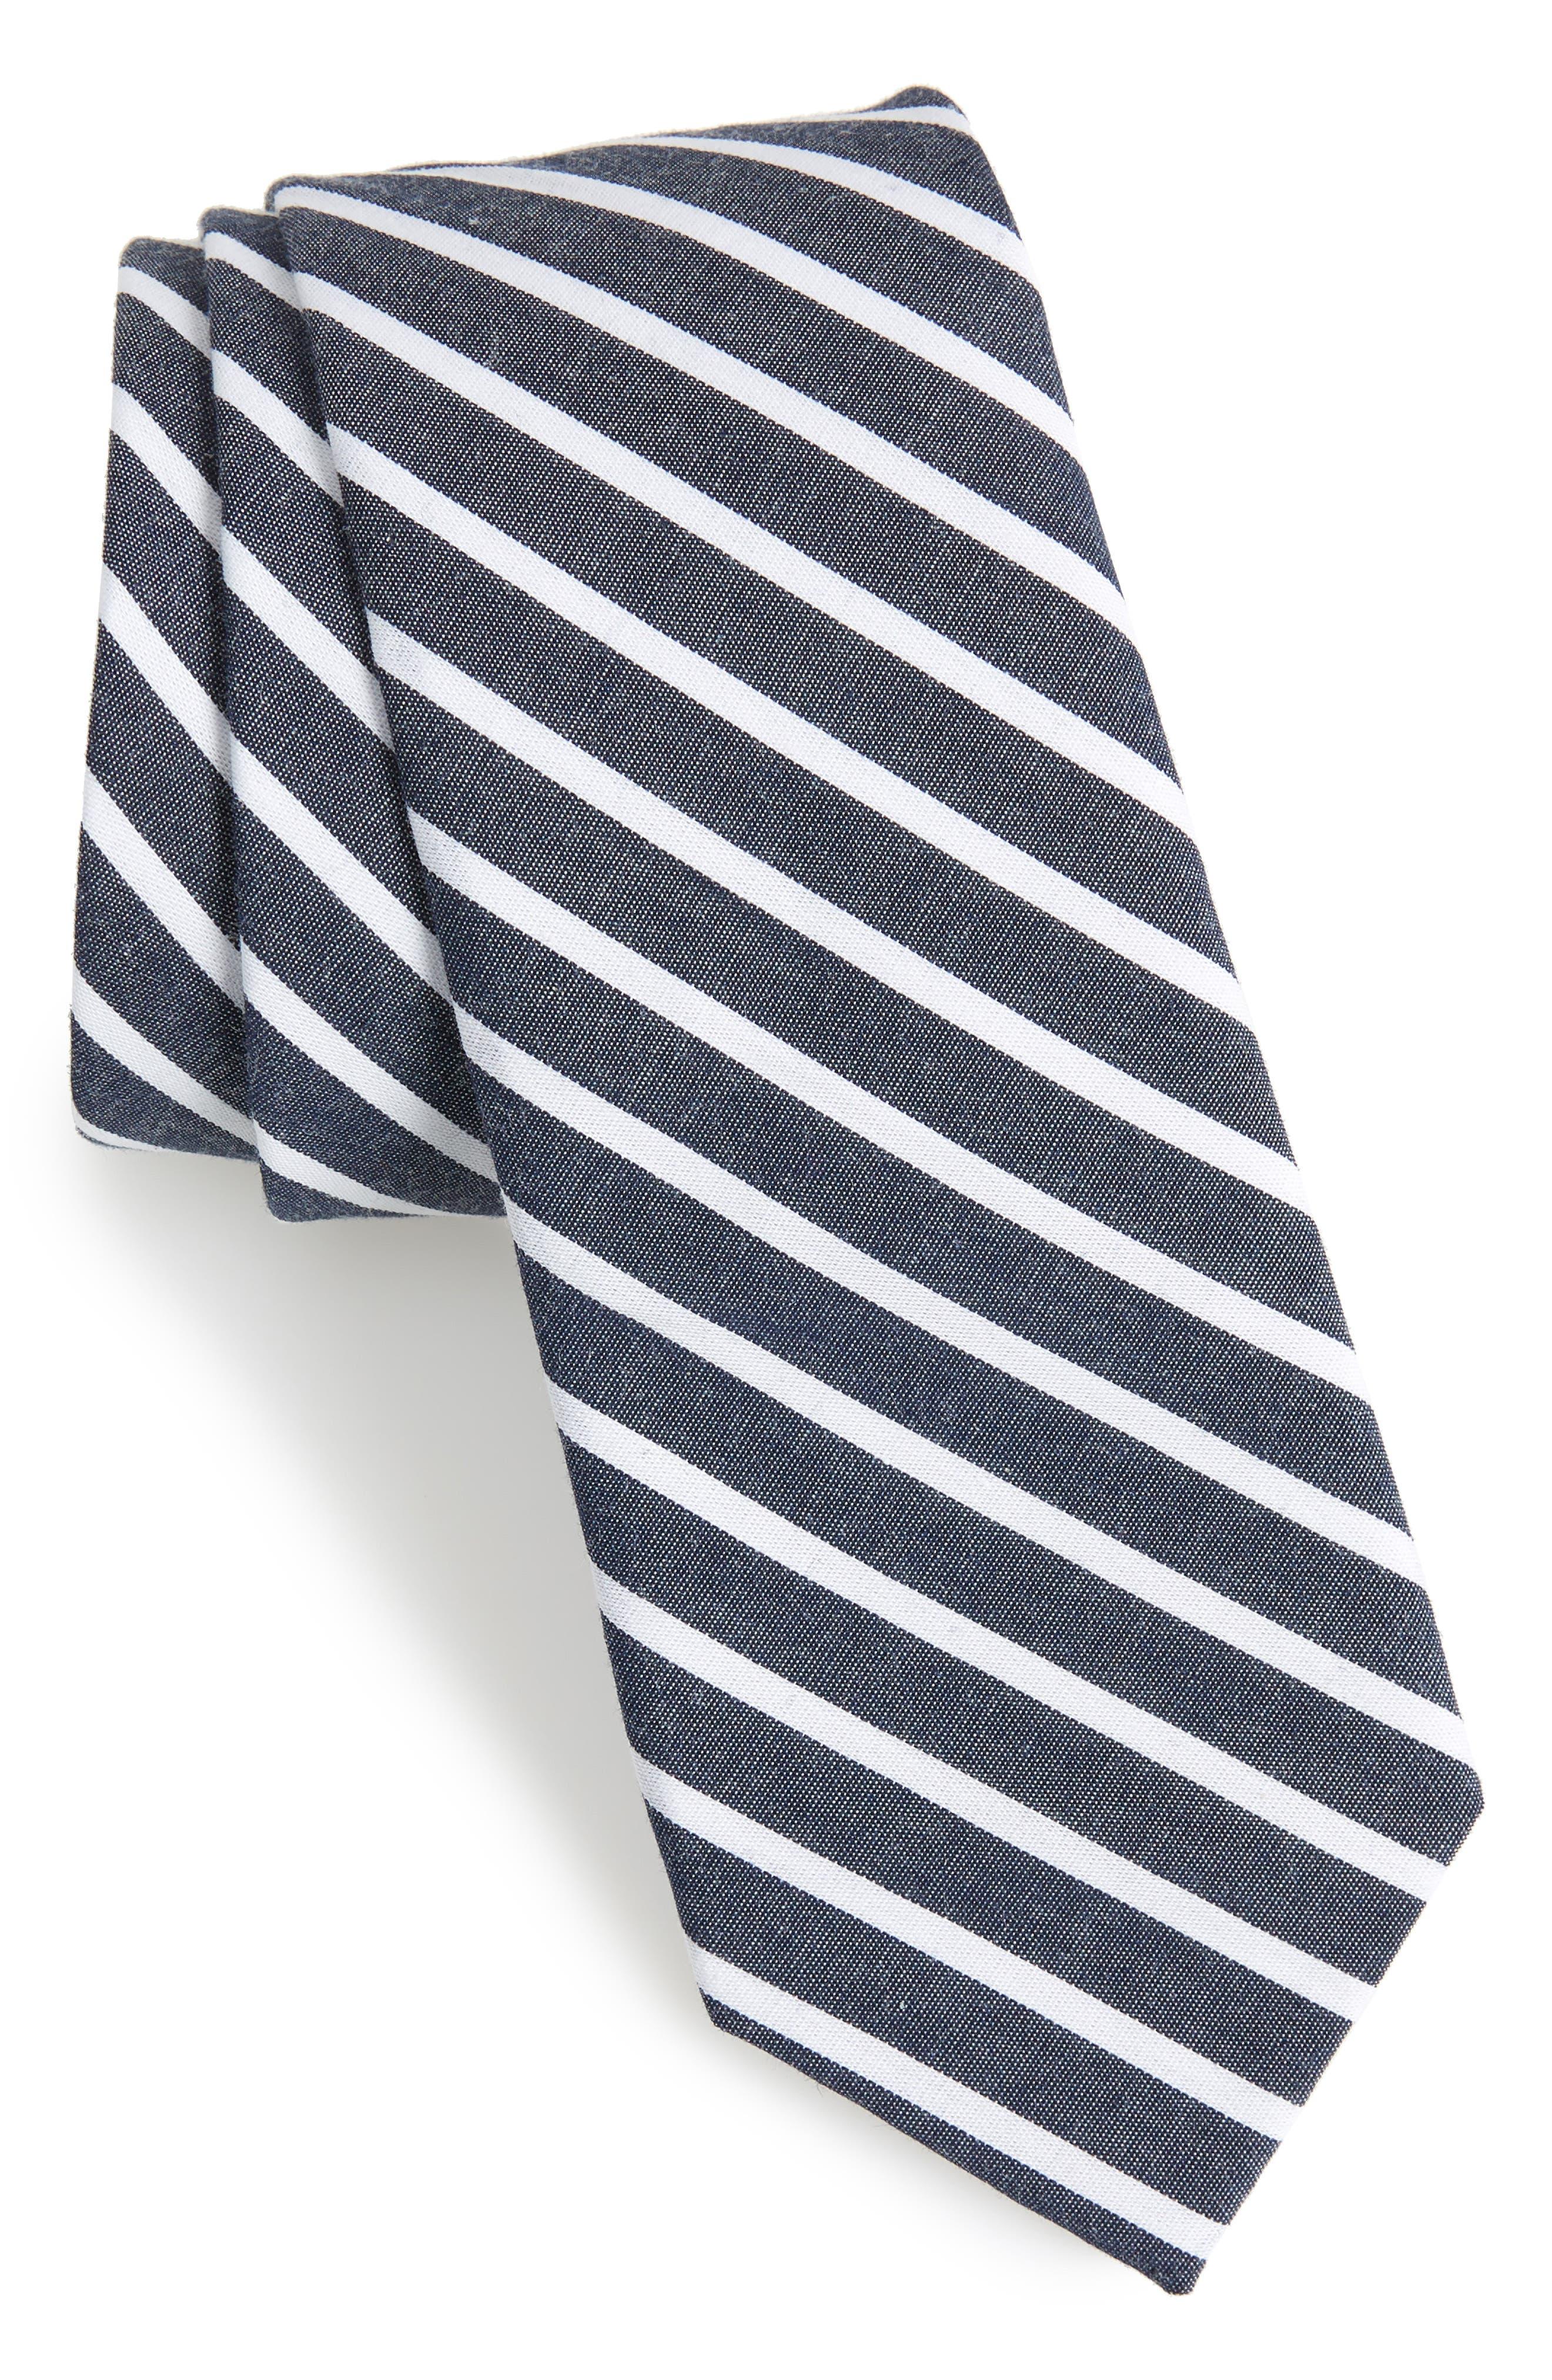 Holborn Stripe Cotton Skinny Tie,                             Main thumbnail 1, color,                             410